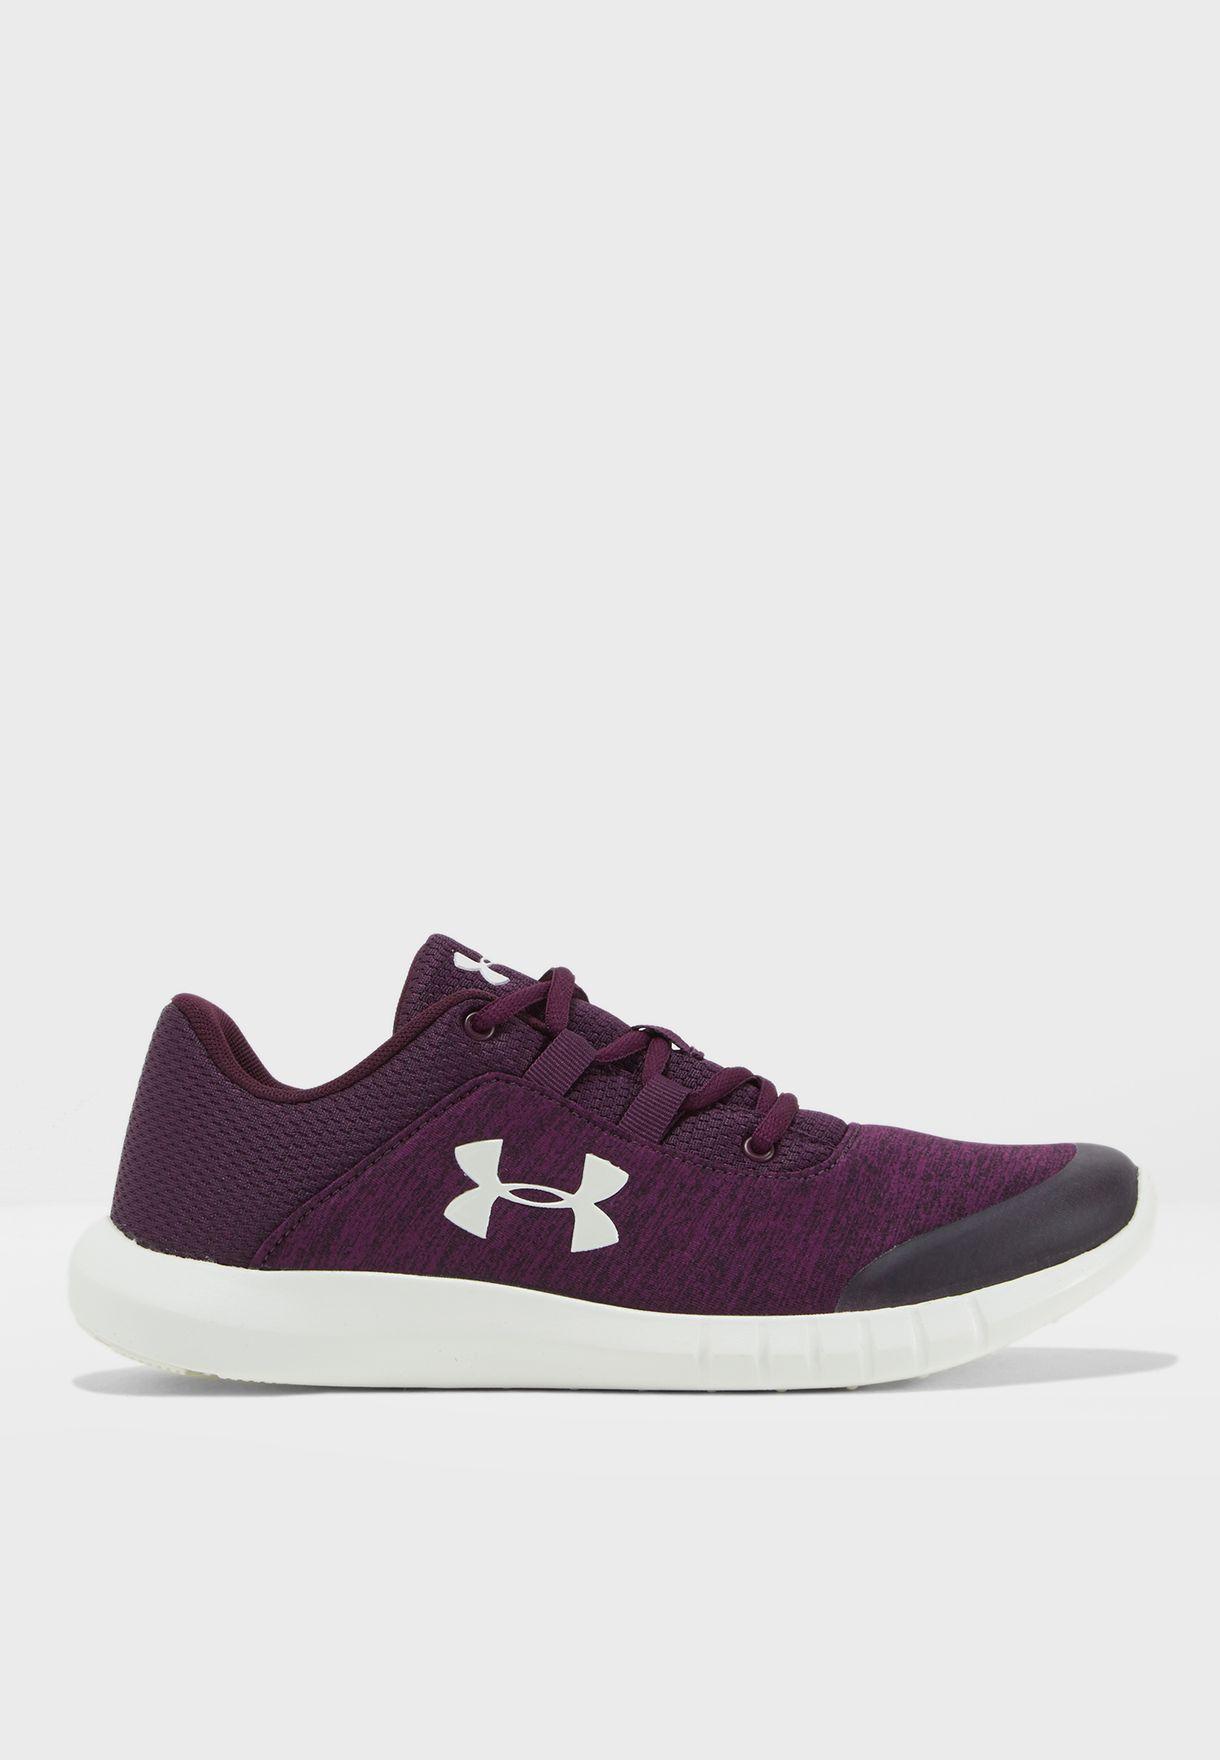 Buy Under Armour purple Mojo for Women